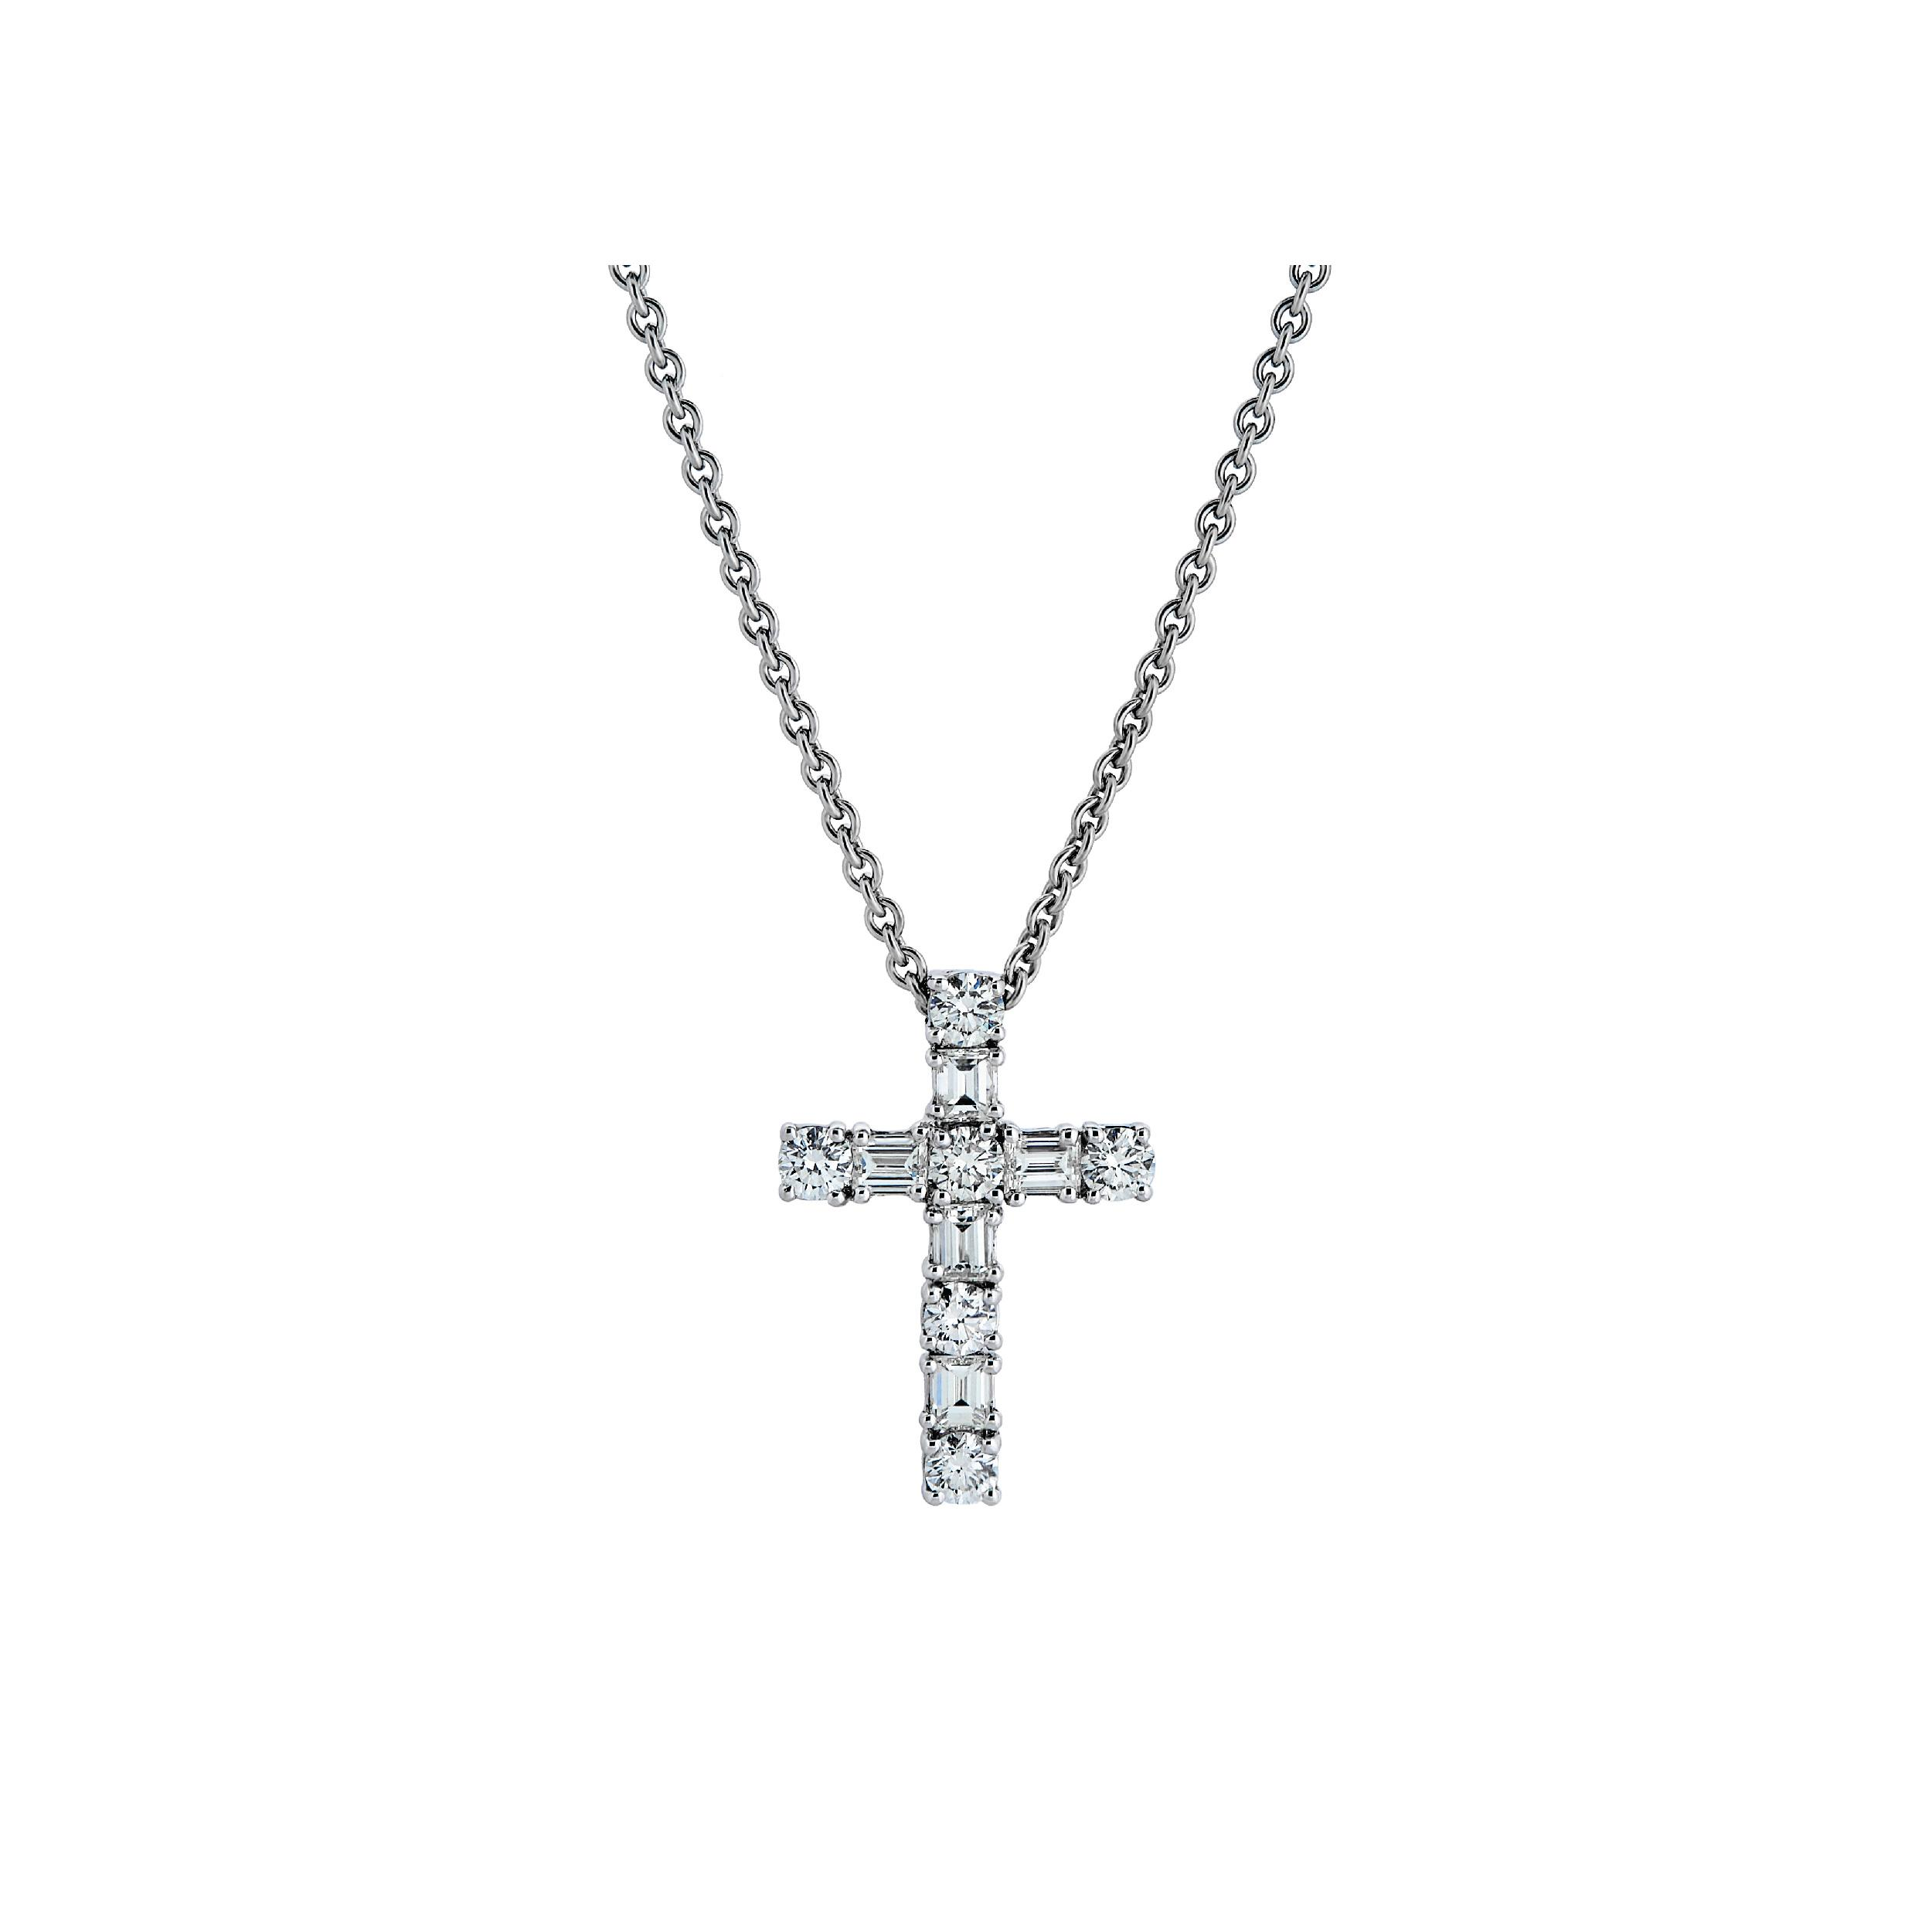 CHATE Крестик с бриллиантами 0,67 ct